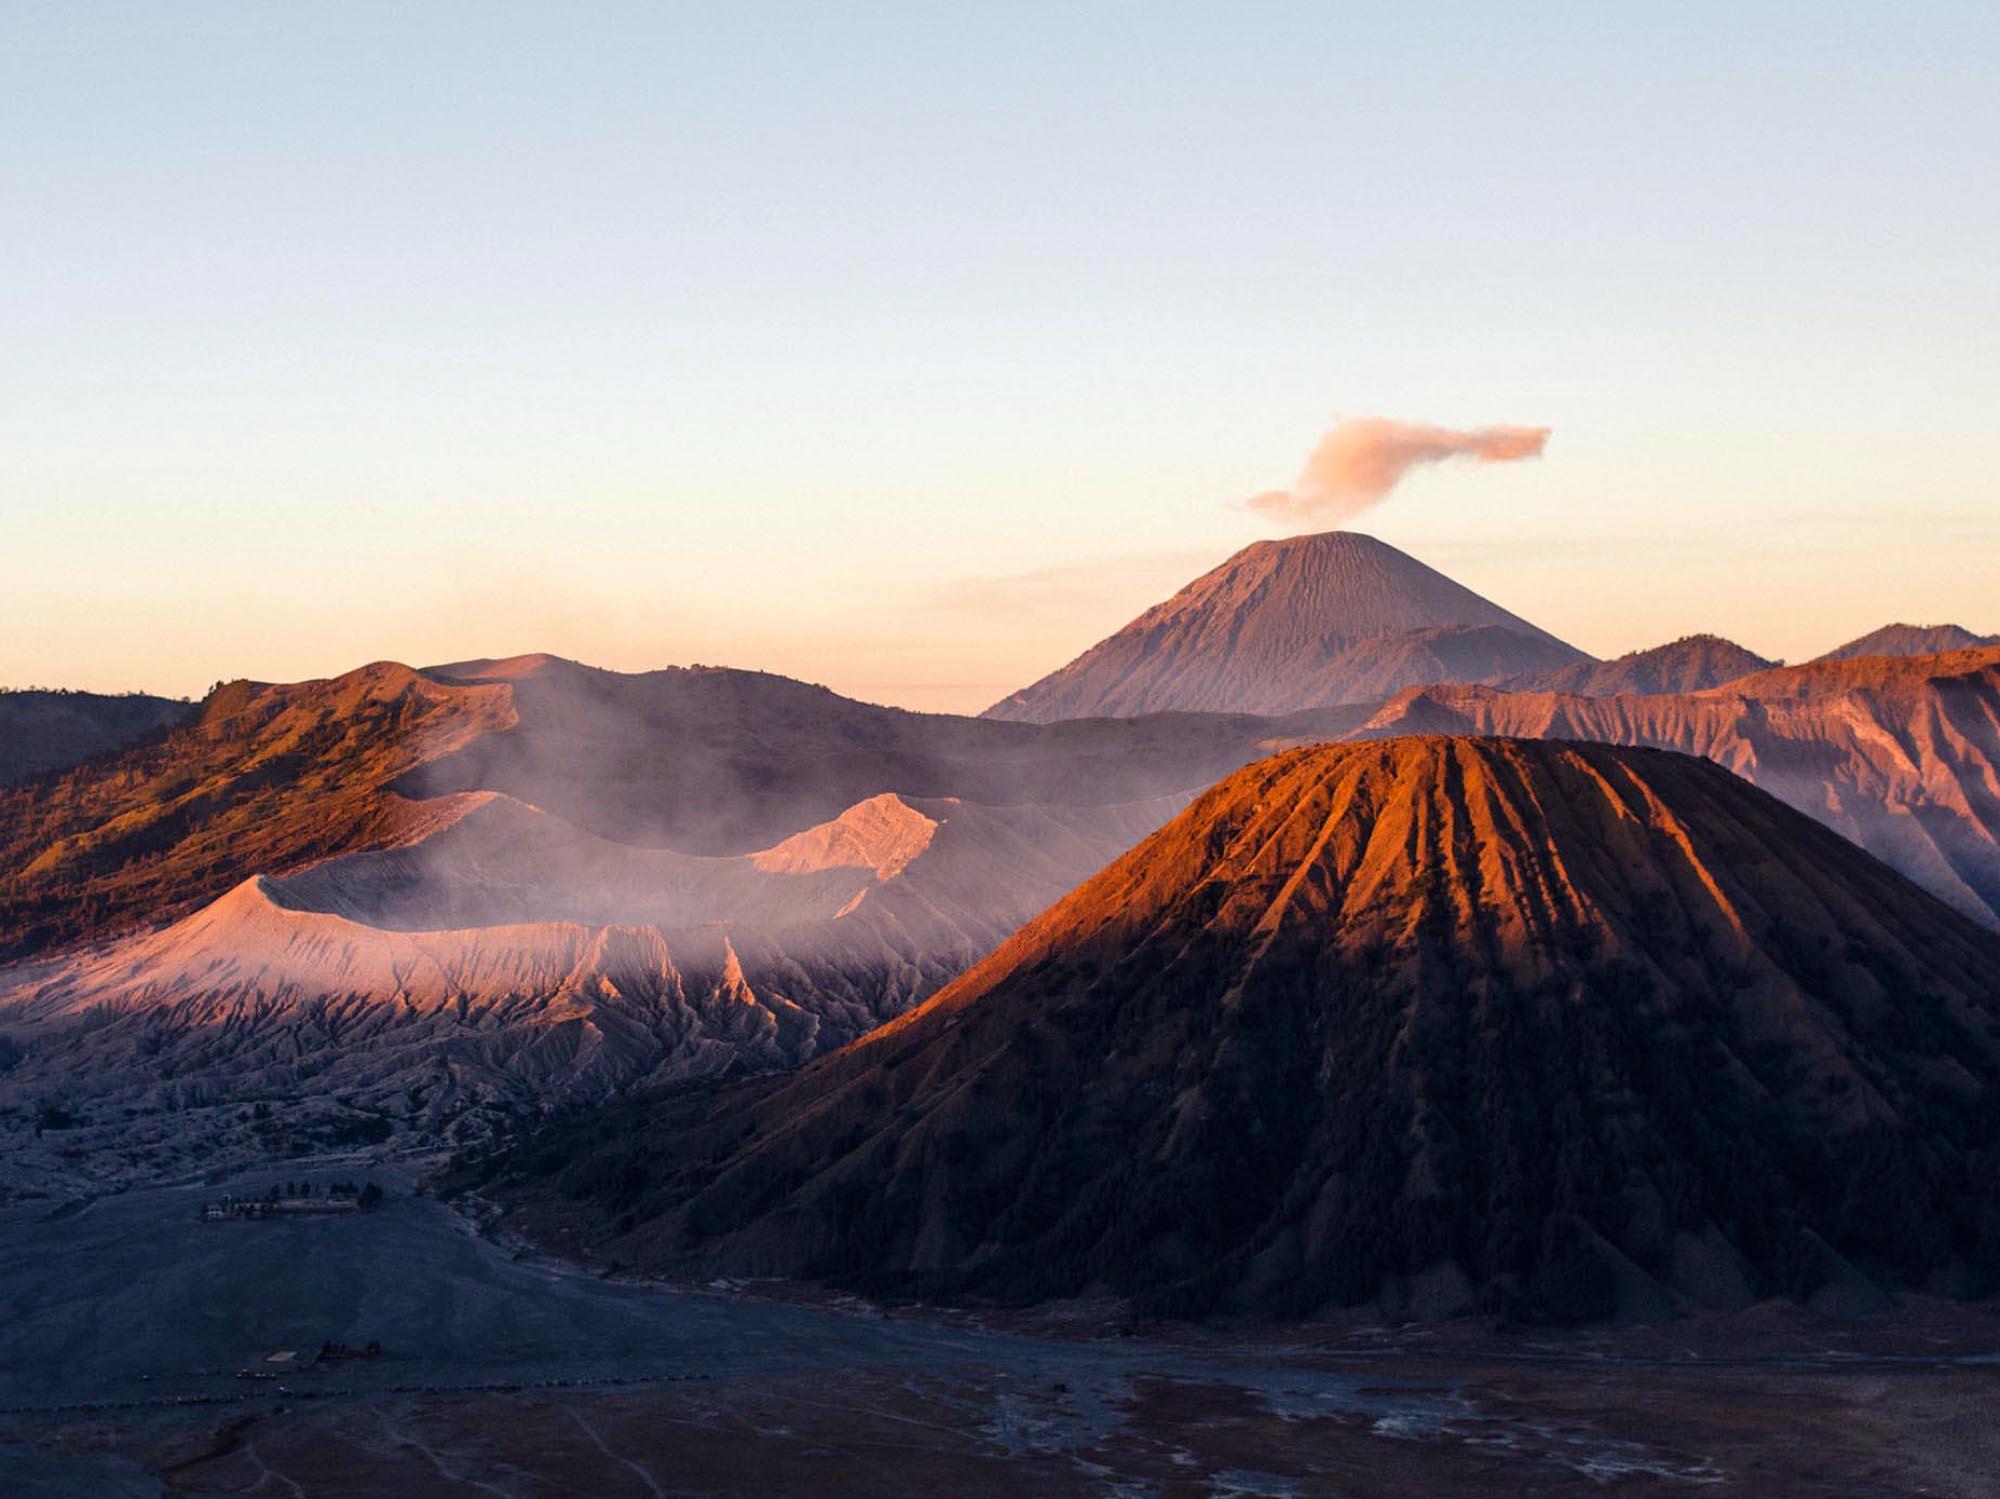 Sunrise at Mount Bromo.